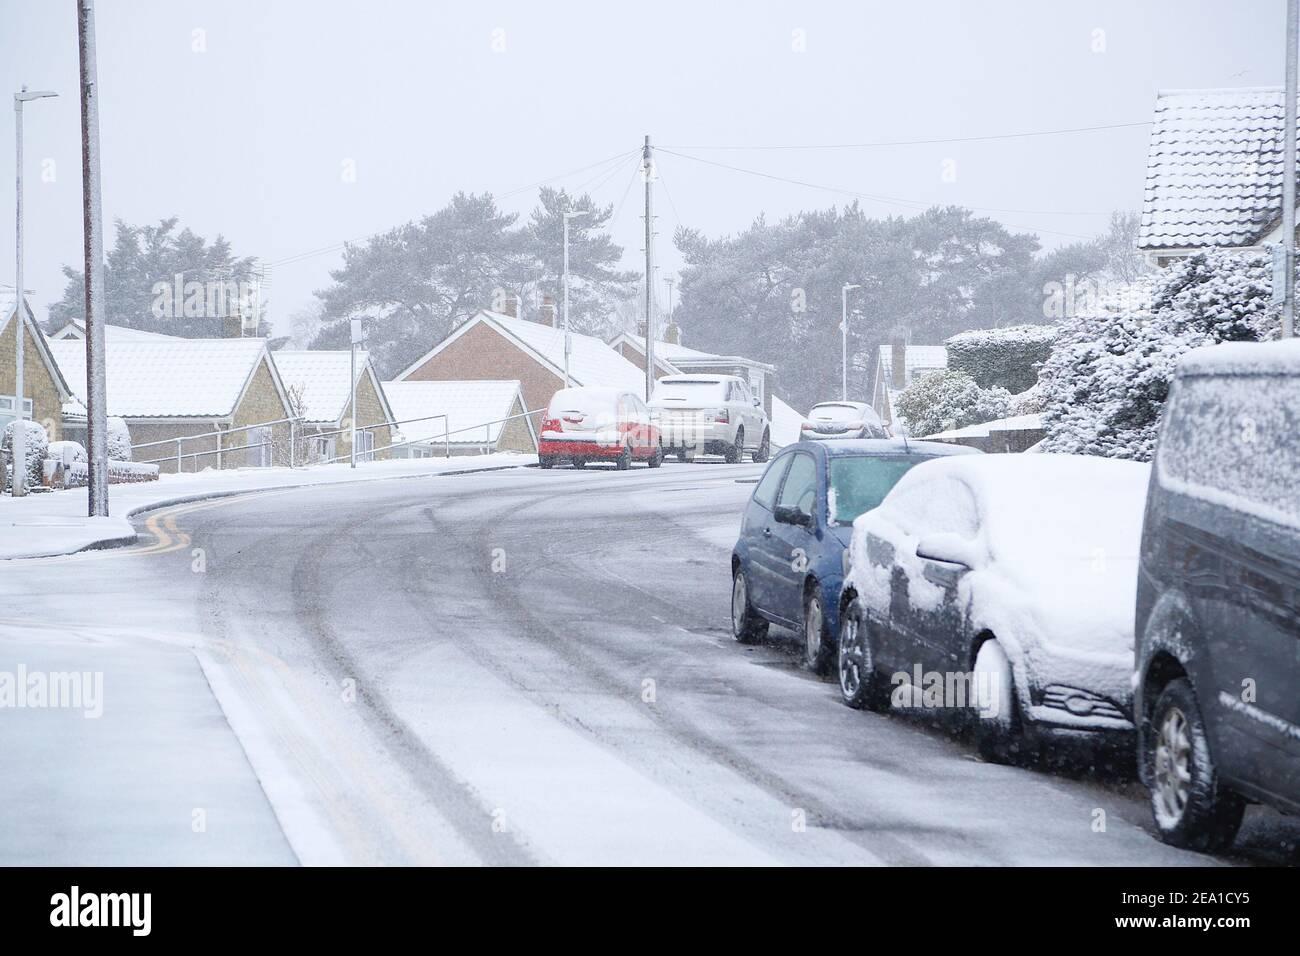 Ashford, Kent, UK. 07 Feb, 2021. UK Weather: Storm Darcy hits the town of Ashford in Kent. Photo Credit: Paul Lawrenson/Alamy Live News Stock Photo